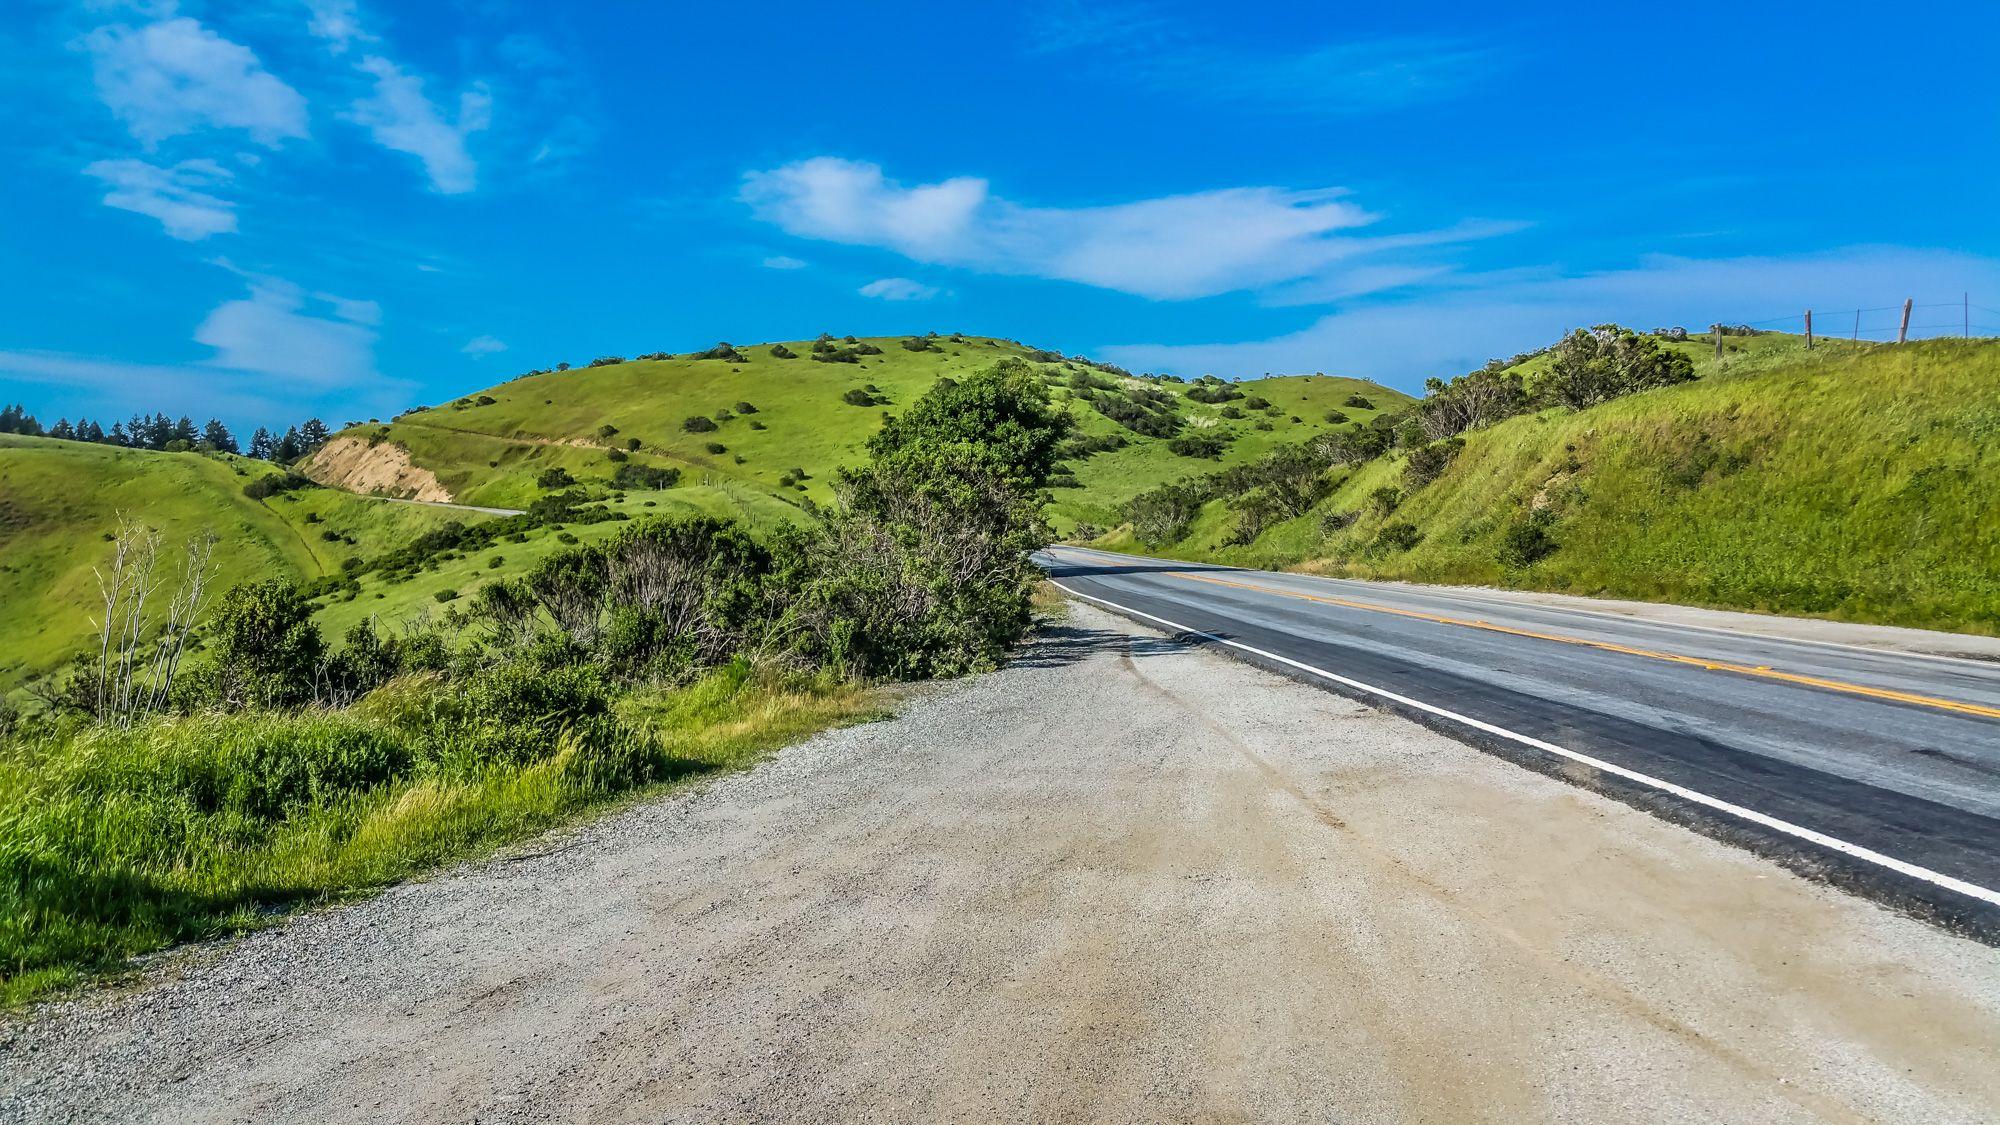 Scenic Route: Skyline Blvd between San Mateo and Santa Cruz